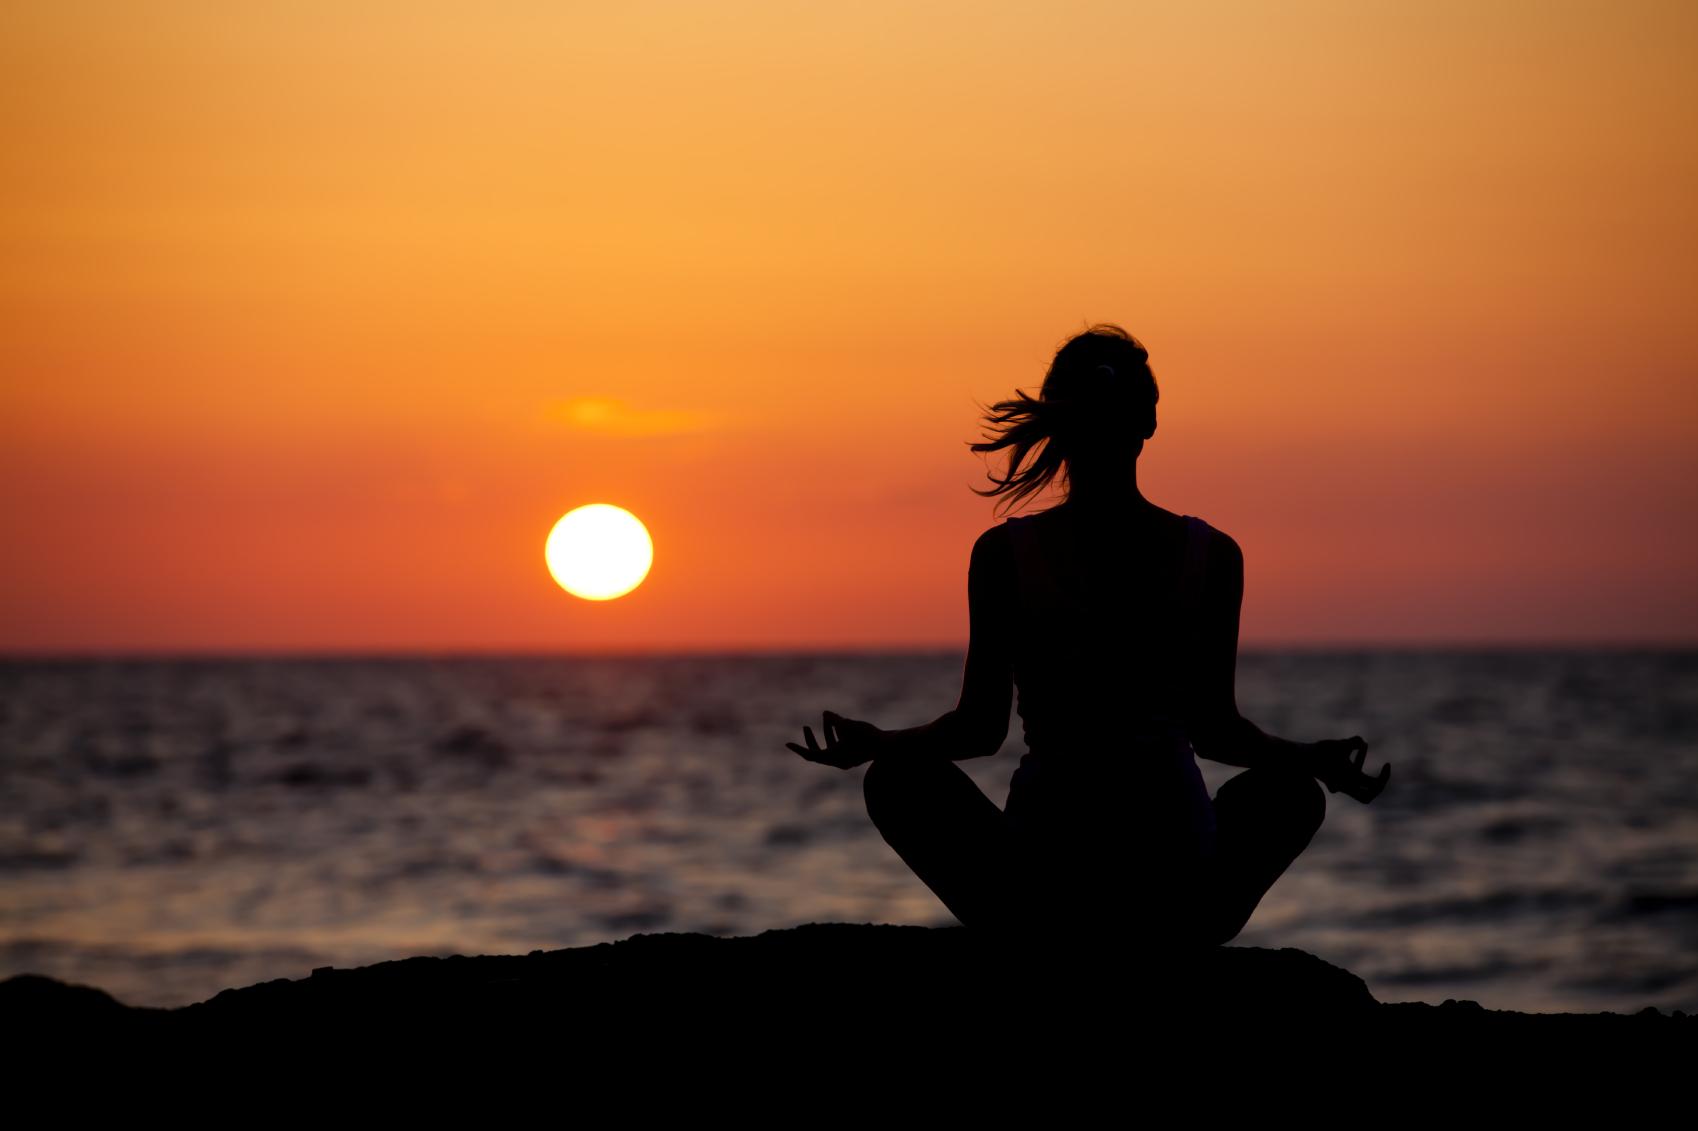 meditation silhouette computer wallpaper 53139